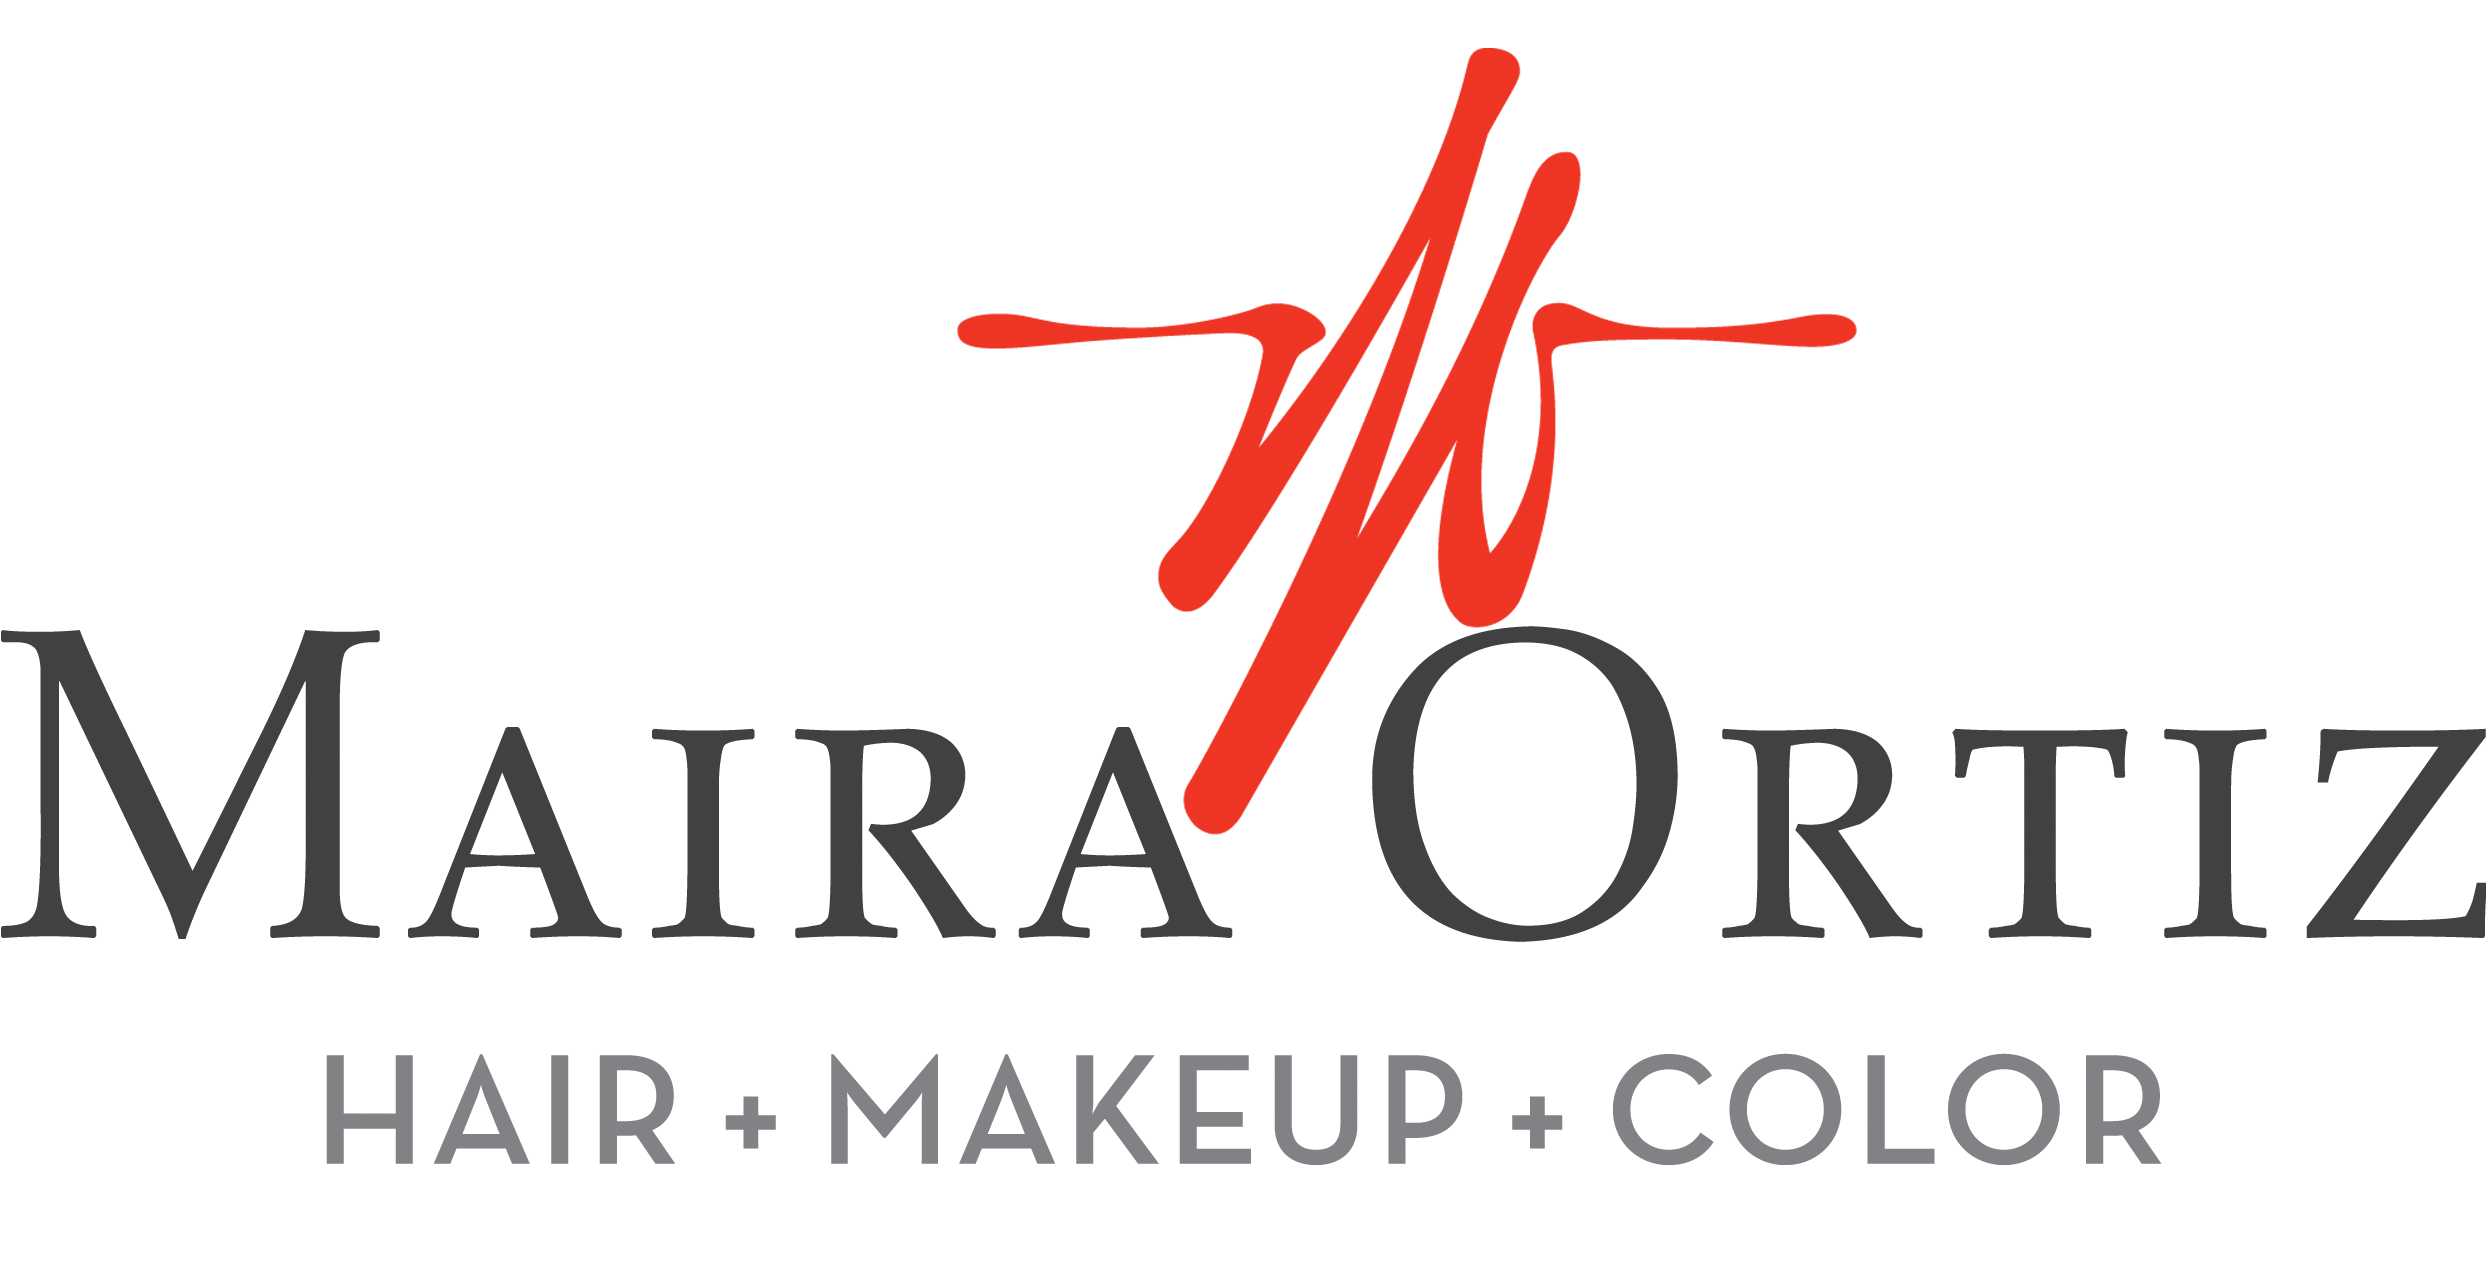 Maira Ortiz Makeup and Hair Artist